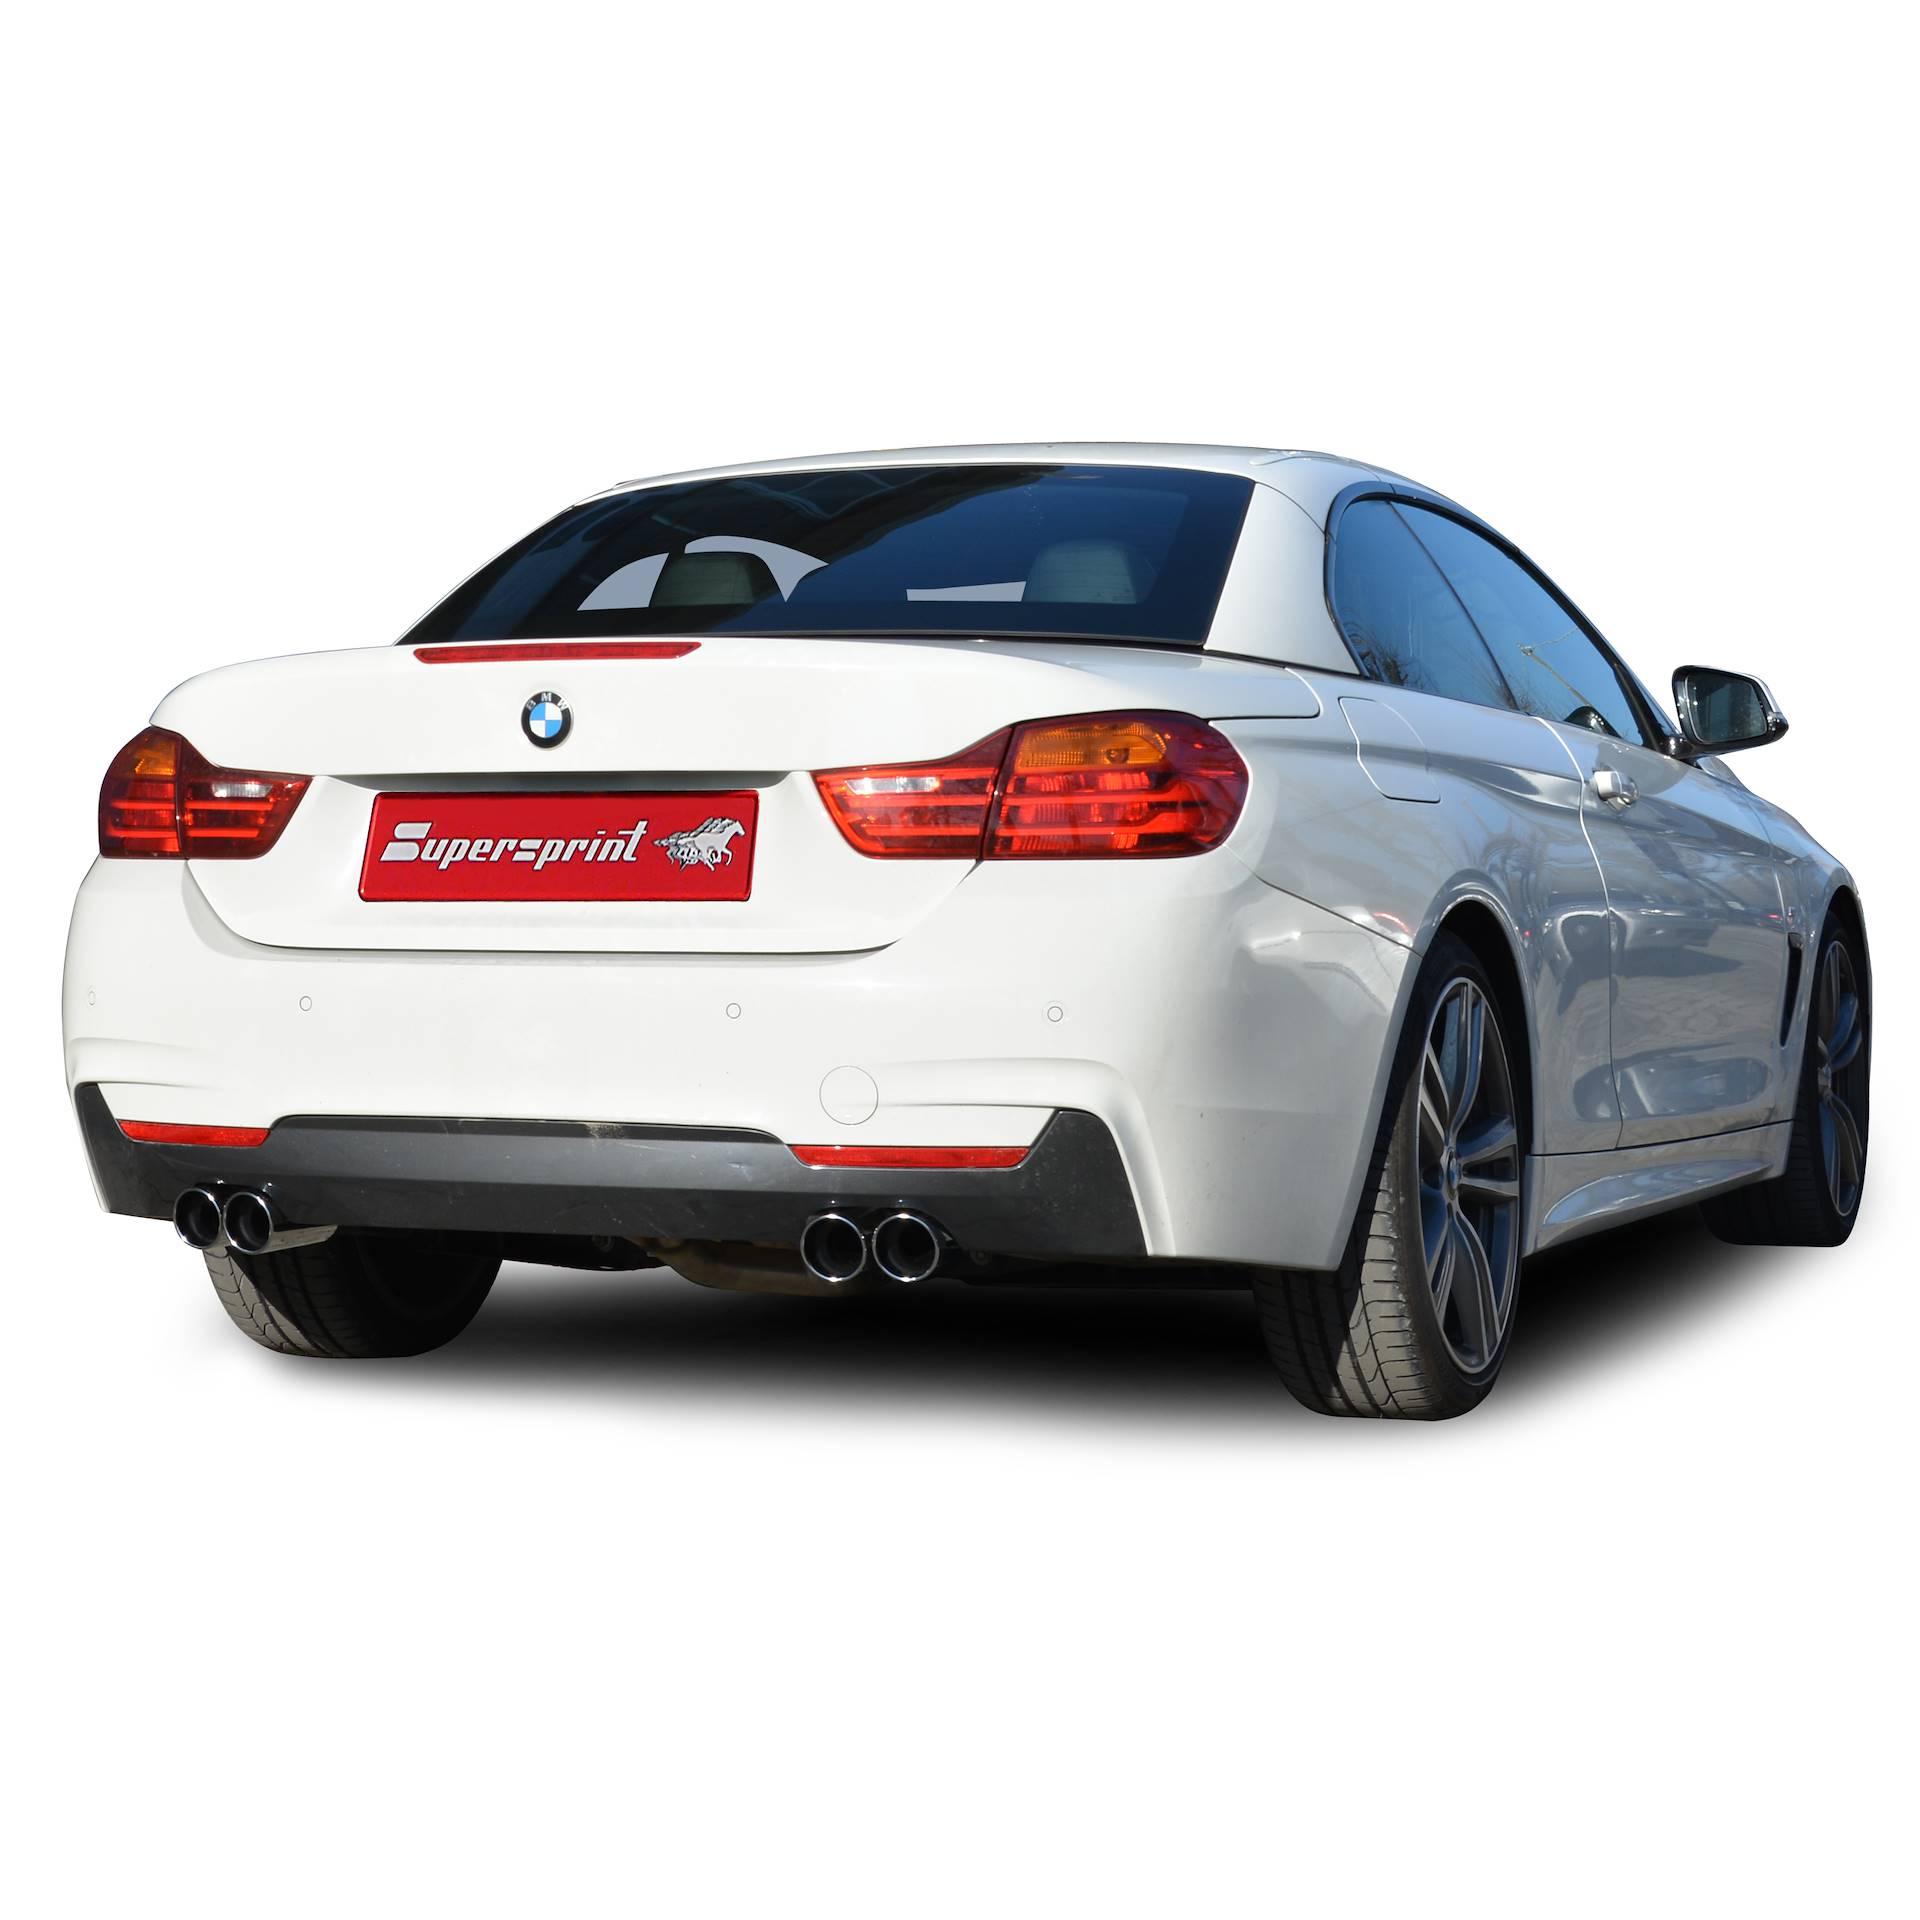 BMW F20 / F21 M135i (320 Hp) 2012 -> Full Supersprint